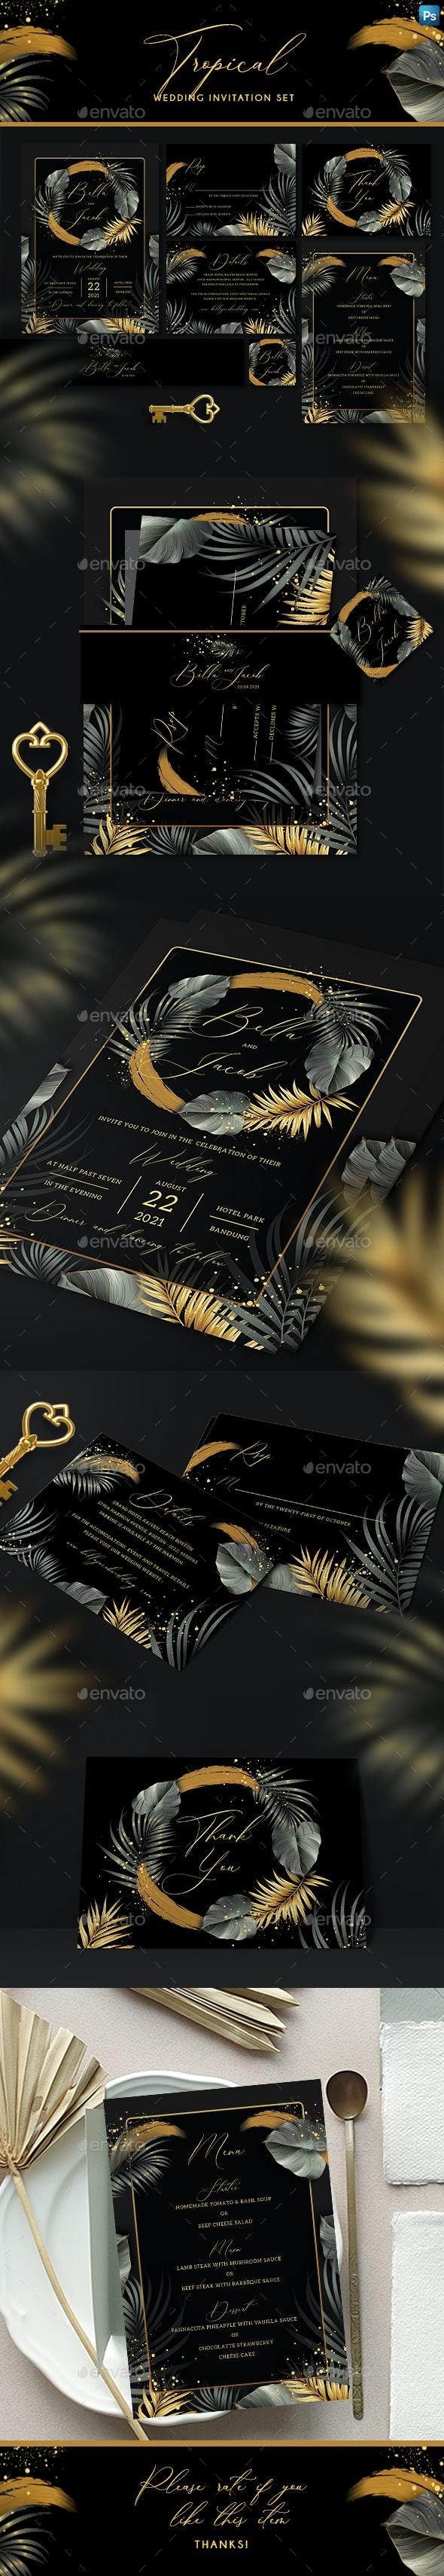 Tropical Wedding Invitation Set - Weddings Cards & Invites